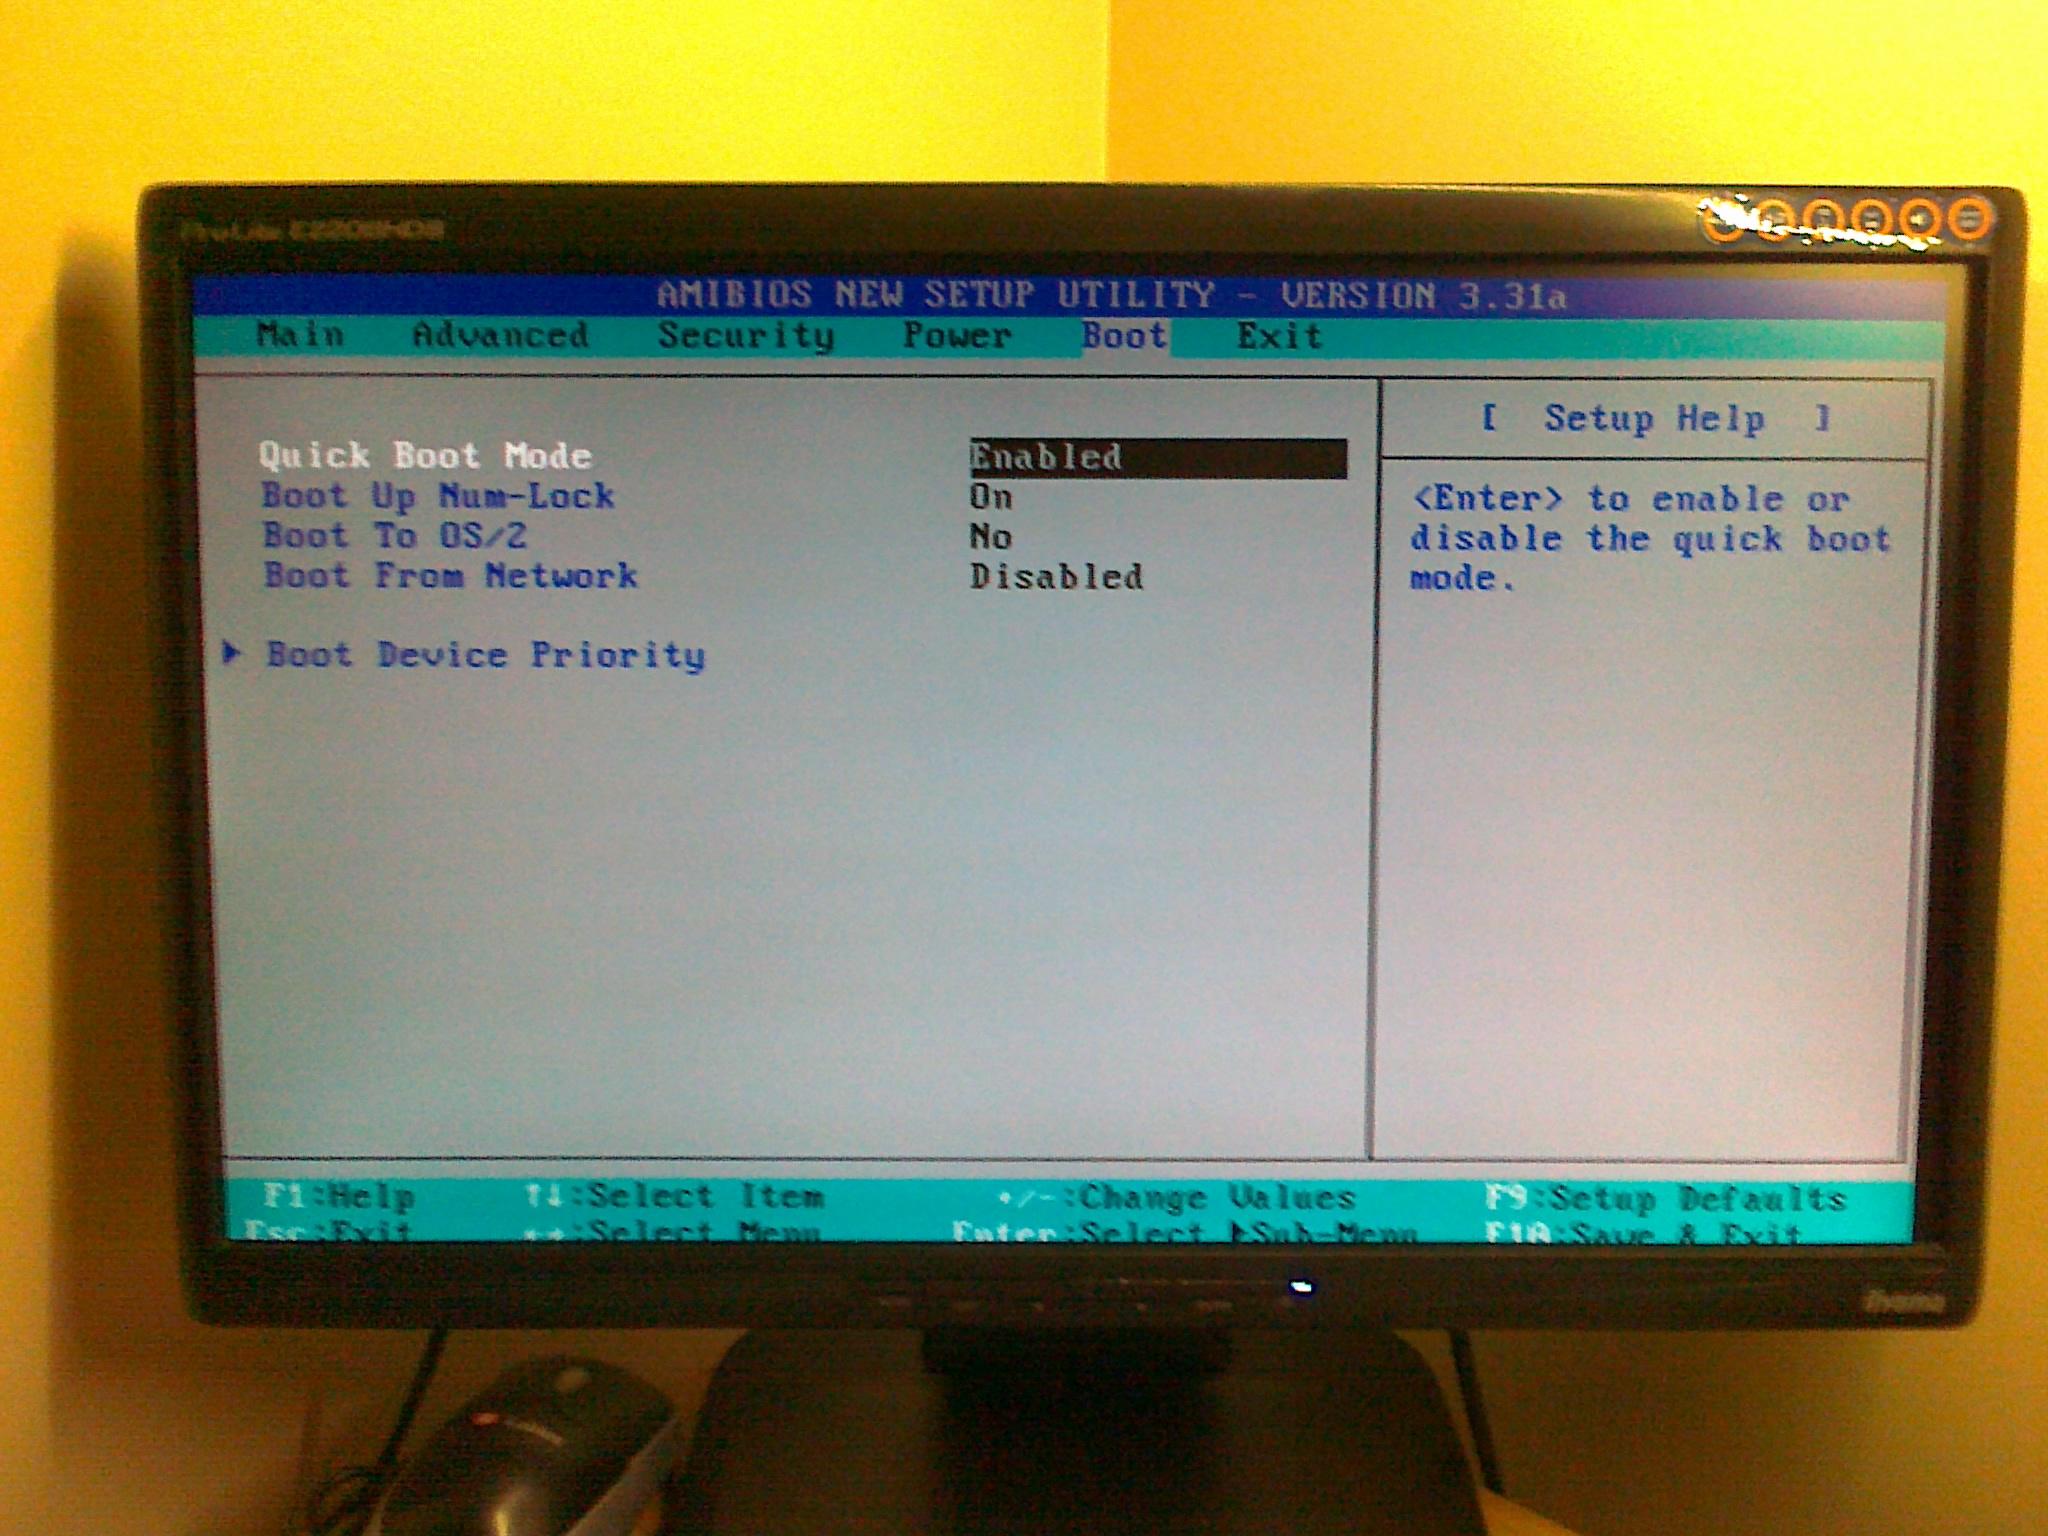 ASRock P4i45E - pokazuje 128 MB karty graficznej, potem czarny ekran